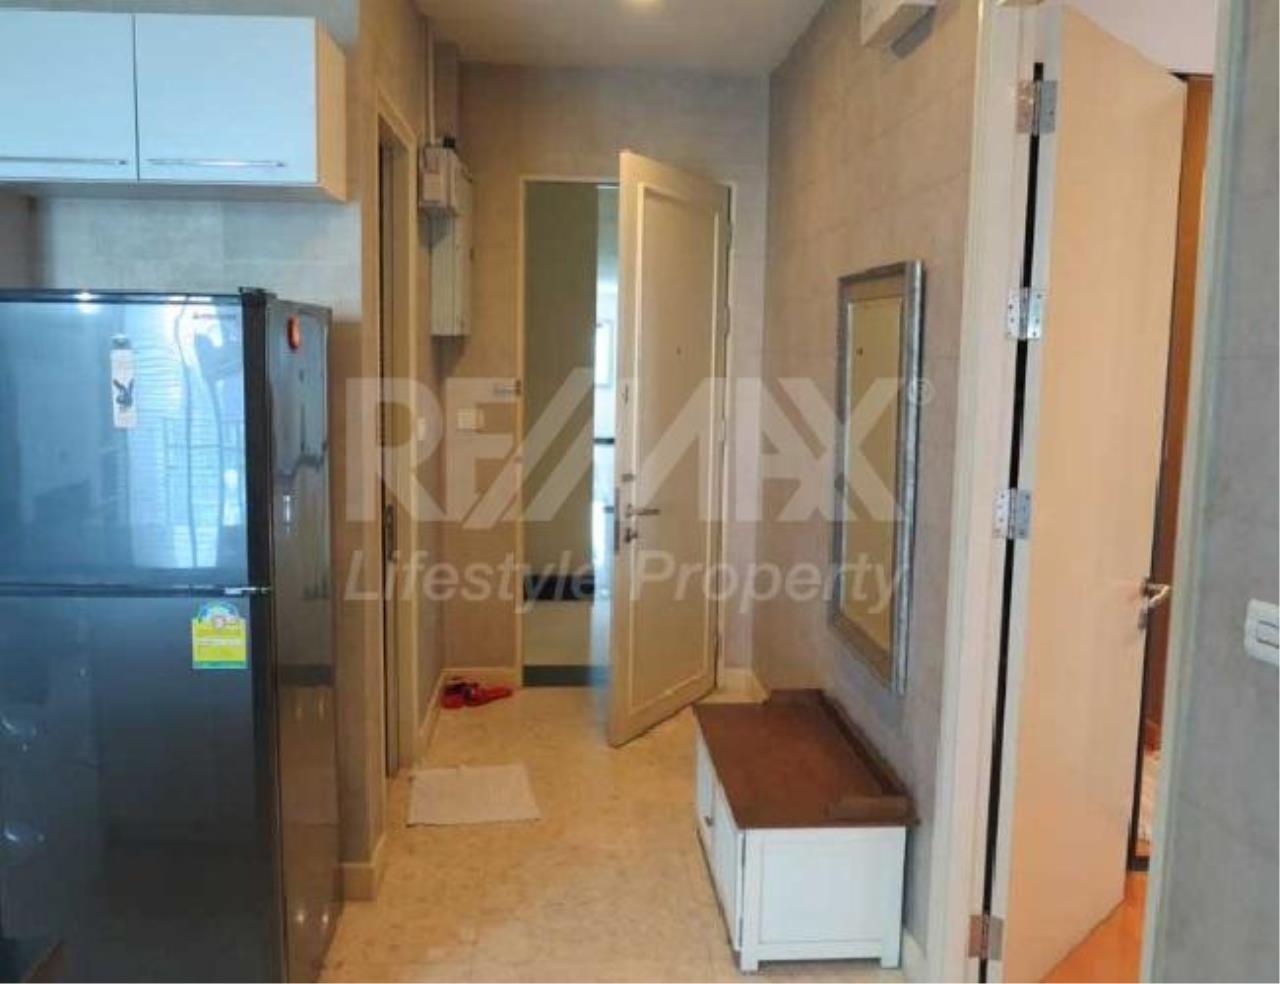 RE/MAX LifeStyle Property Agency's Nusasiri Grand 9